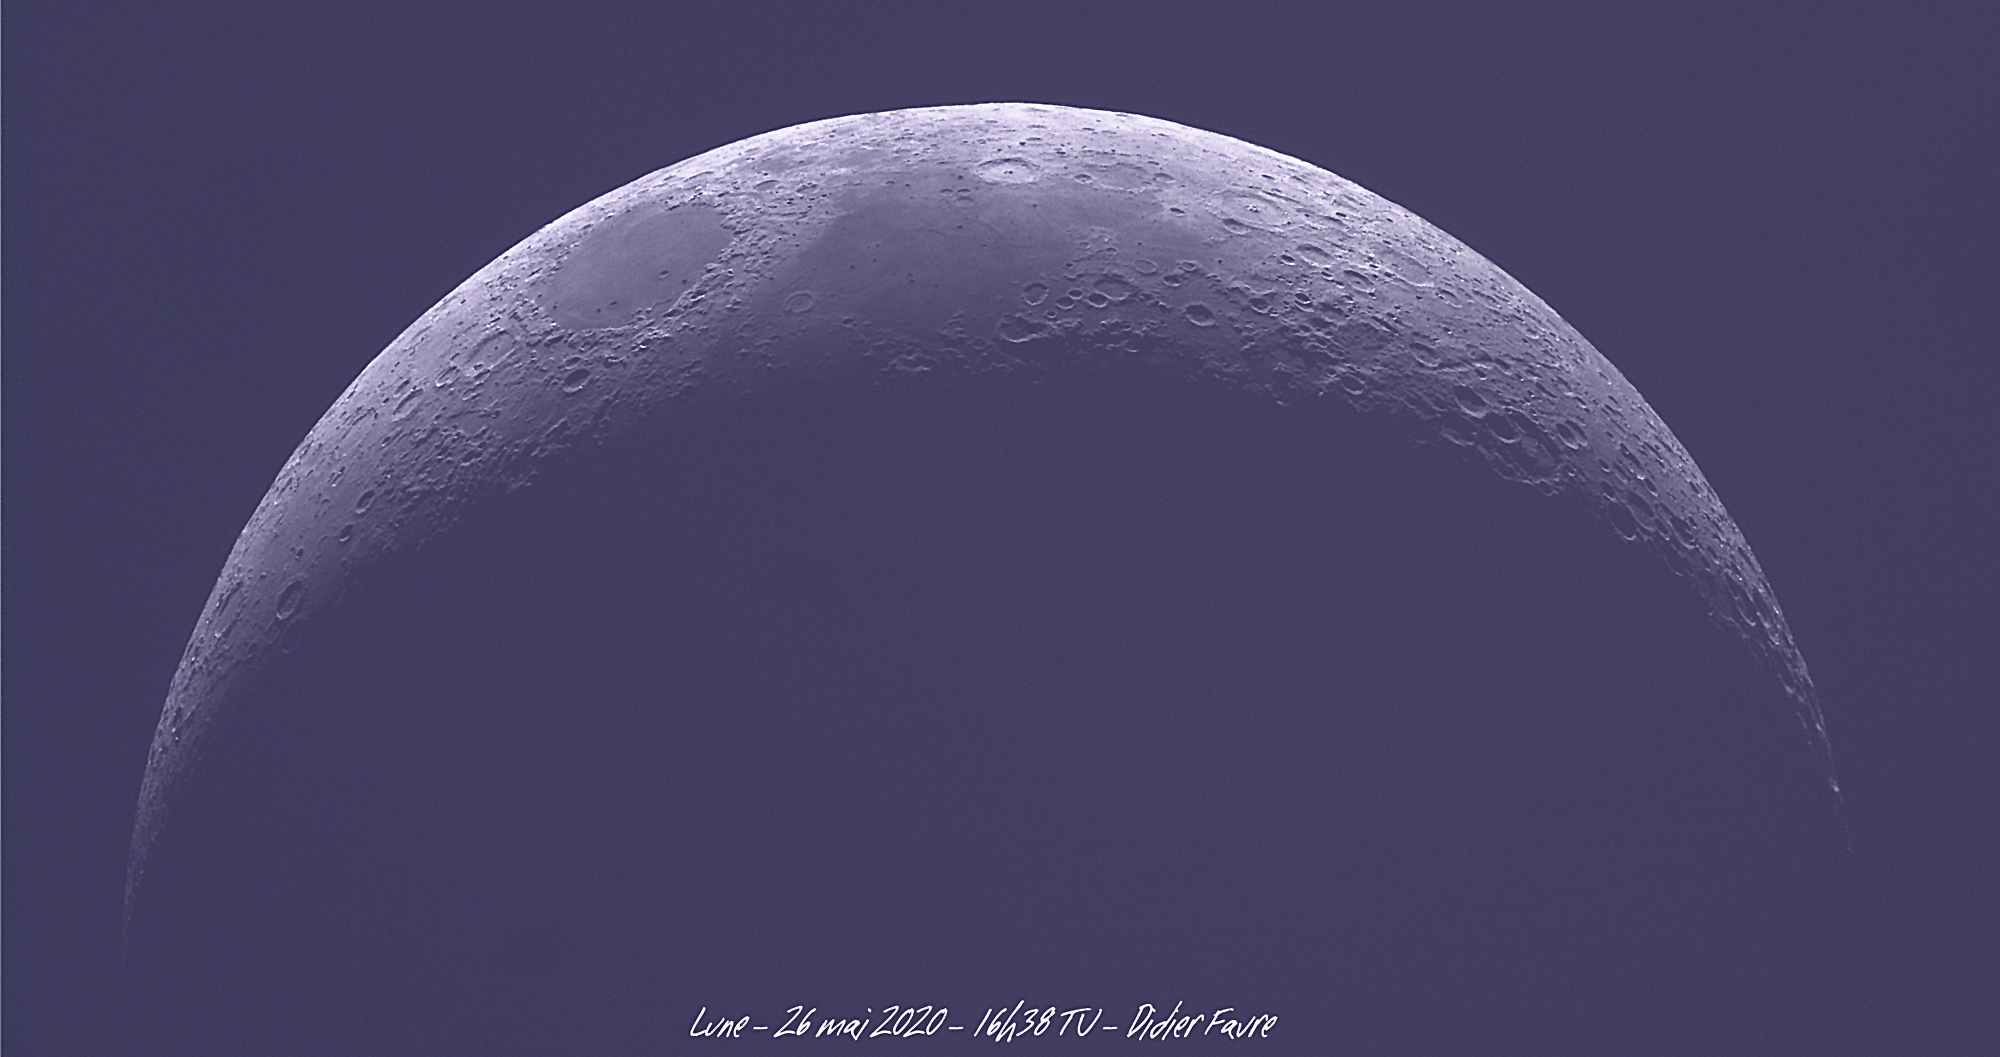 26 mai 2020 - Lune WEB